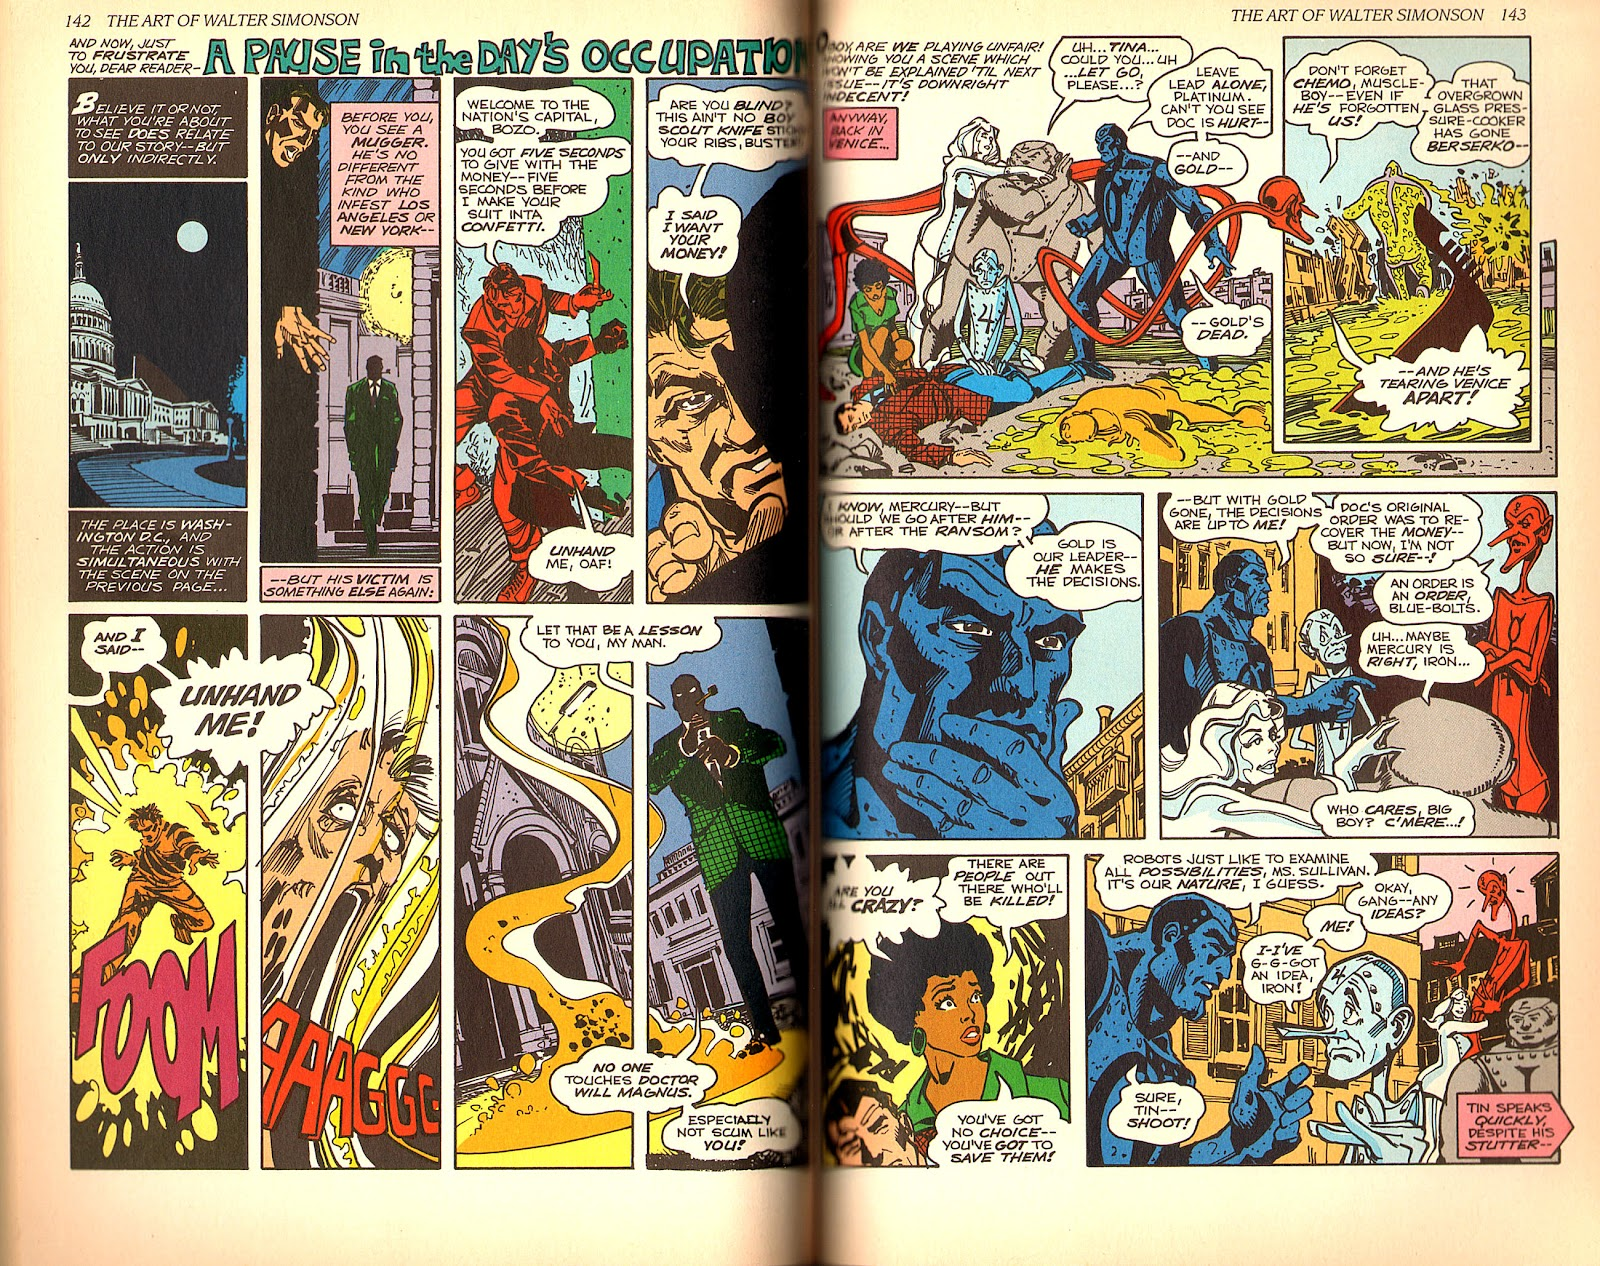 Read online The Art of Walter Simonson comic -  Issue # TPB - 73